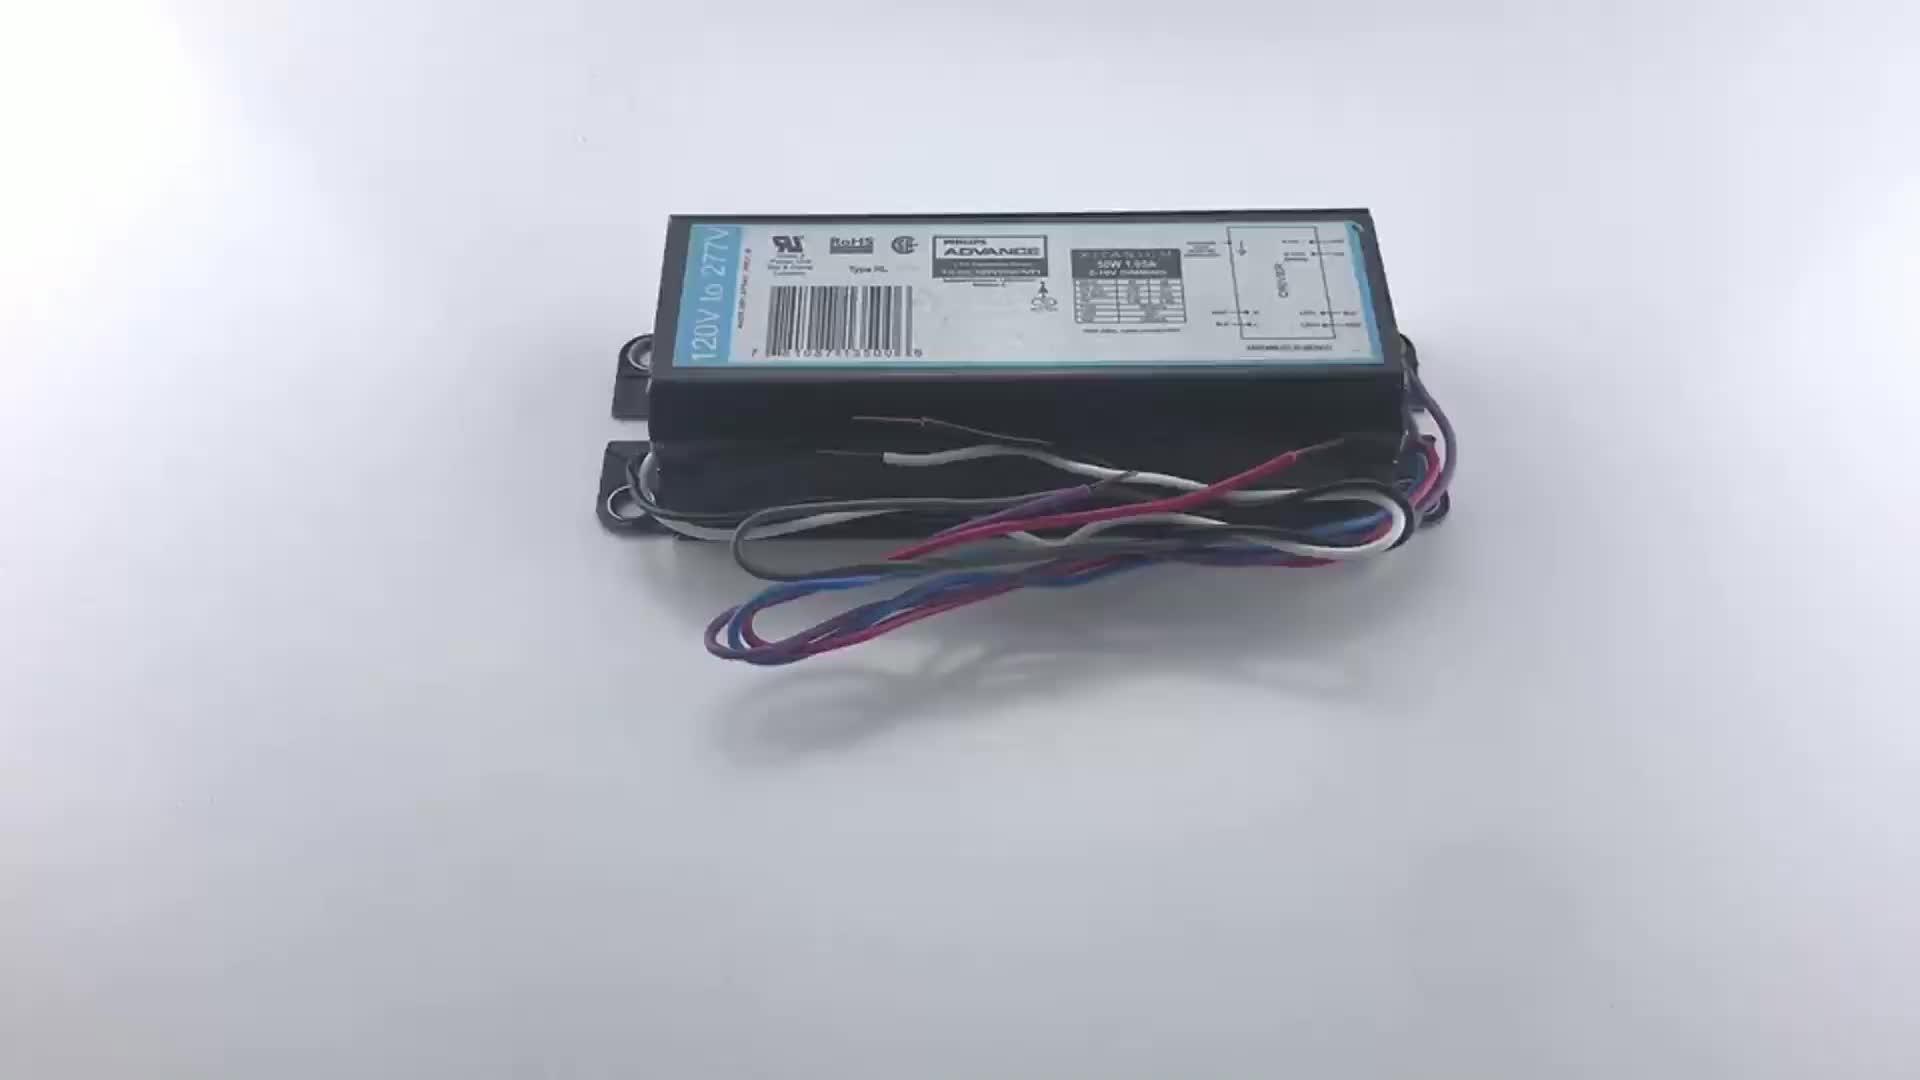 40 W 0.3-1.0A 230 V S175 Xitanium Lite Programlanabilir PHILIPS LED Açık sürücü